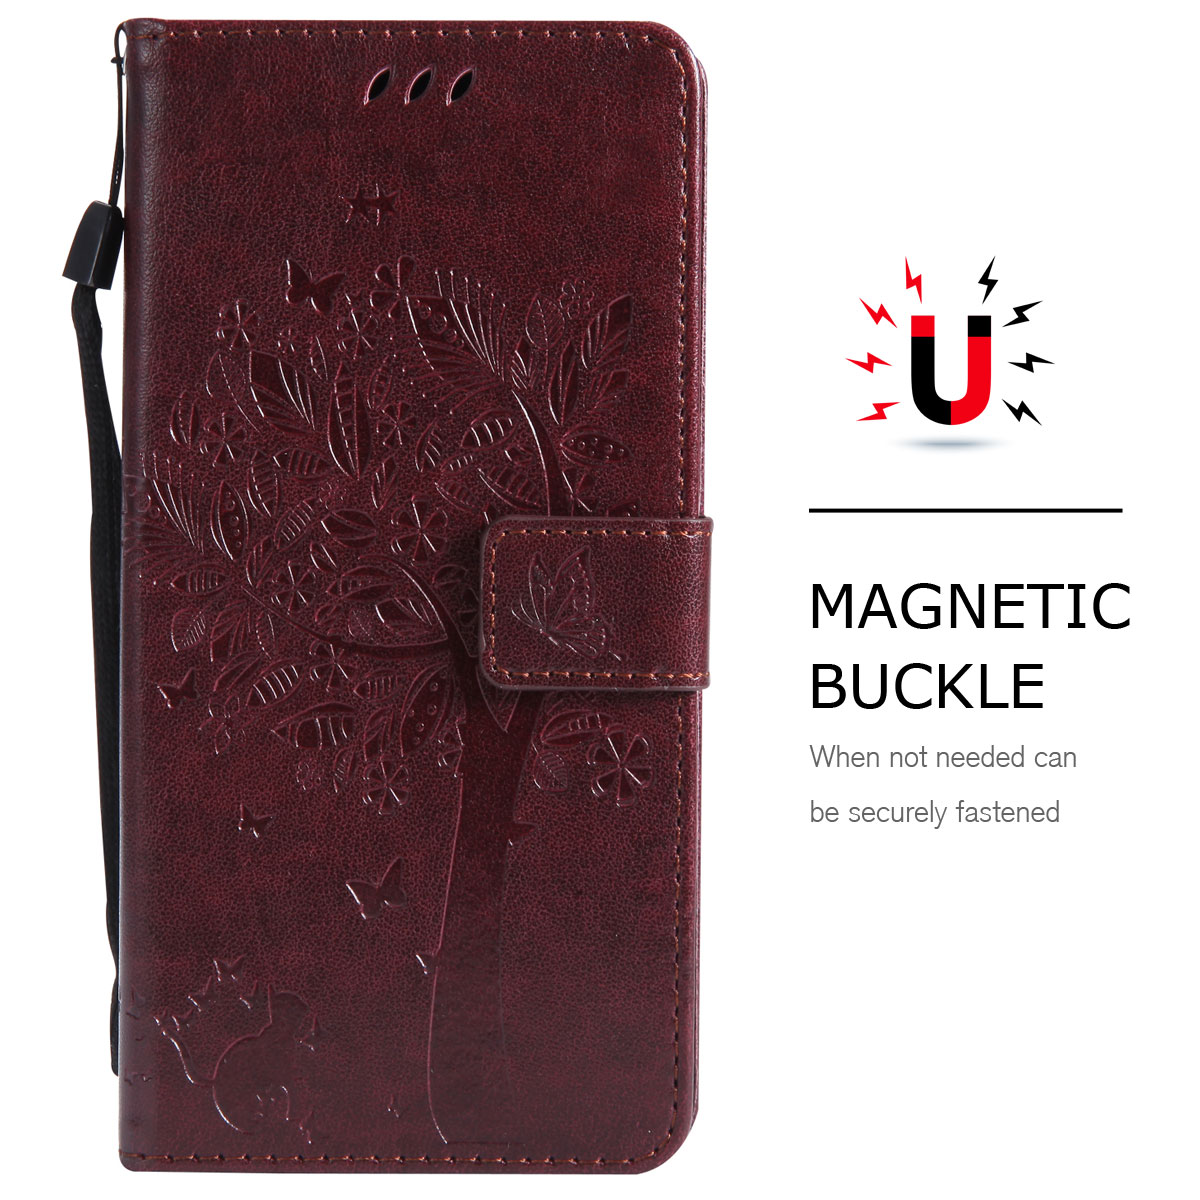 Magnetic-Leather-Credit-Card-Holder-Flip-Case-Cover-For-Google-Pixel-2-2-XL thumbnail 79